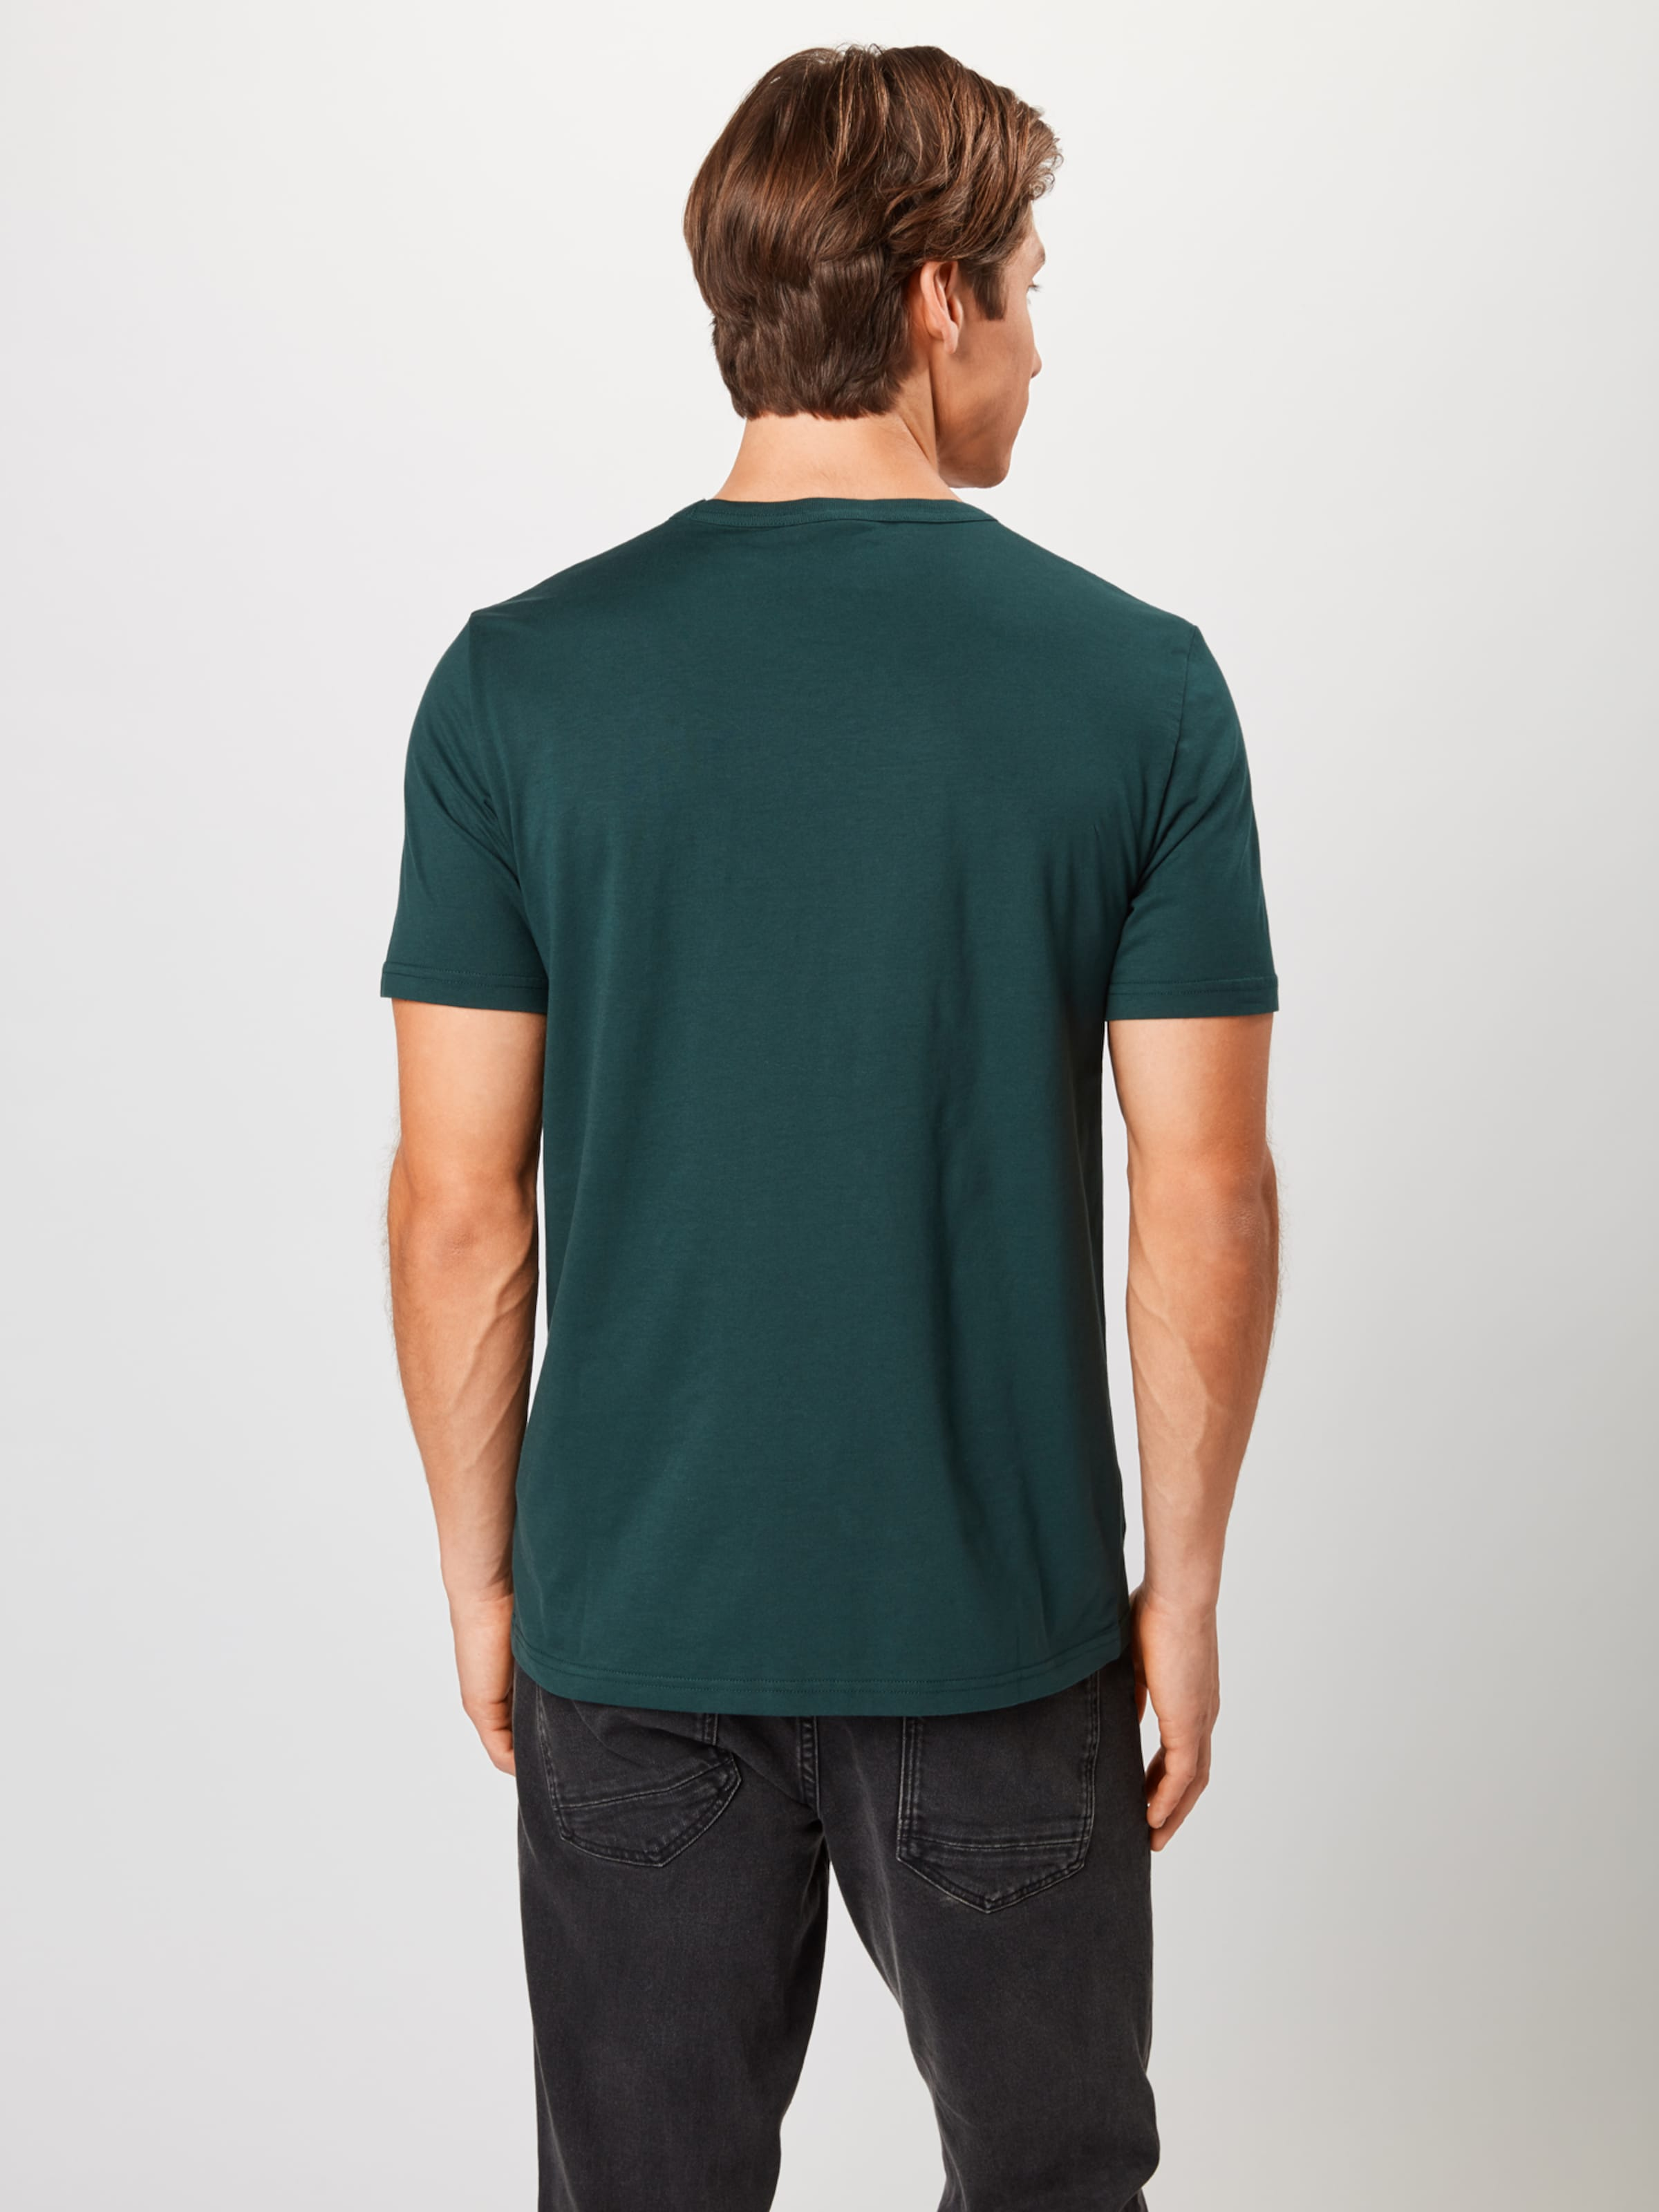 Armedangels Shirt Tanne Pong' In 'paaul Ping lK3TcF51uJ